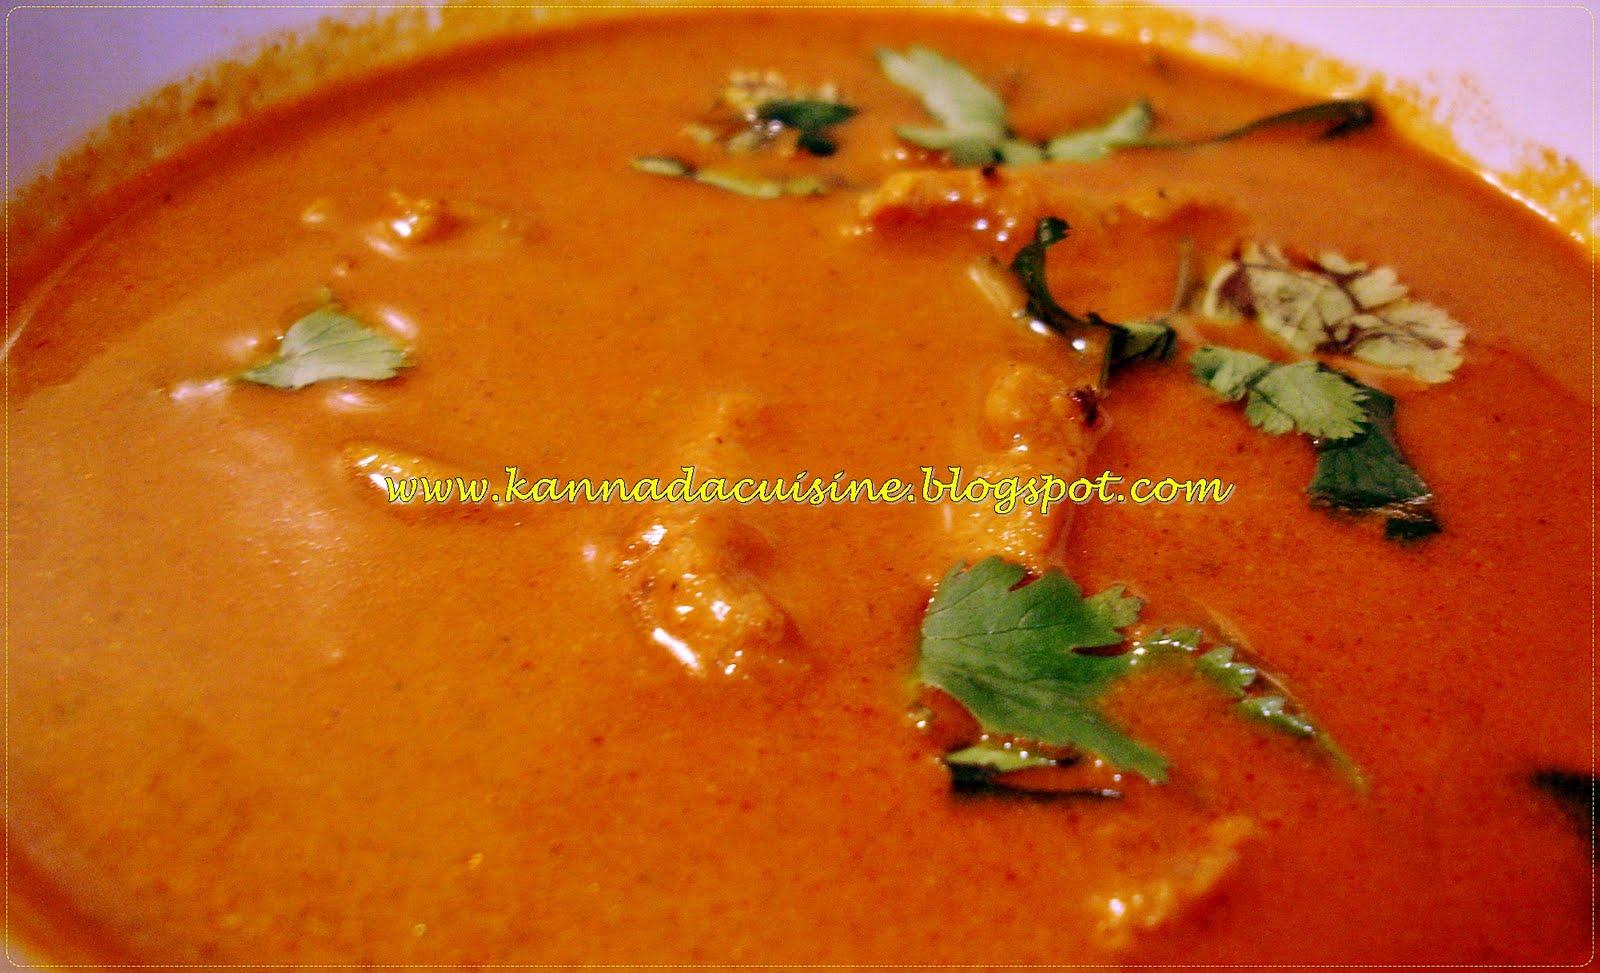 Kannada cuisine koli saaru chicken curry forumfinder Gallery